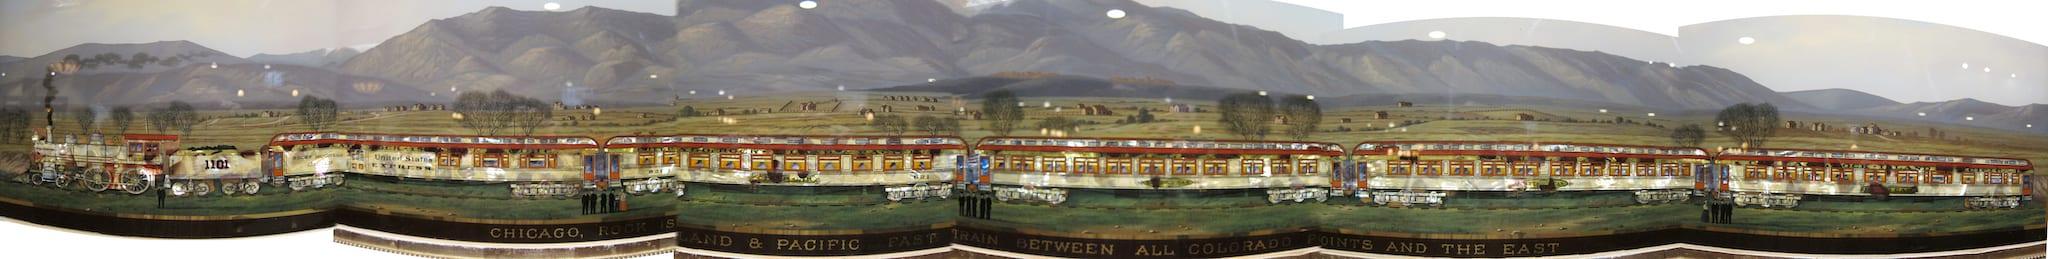 Mother of Pearl Railroad Advertisement Glenwood Springs Colorado